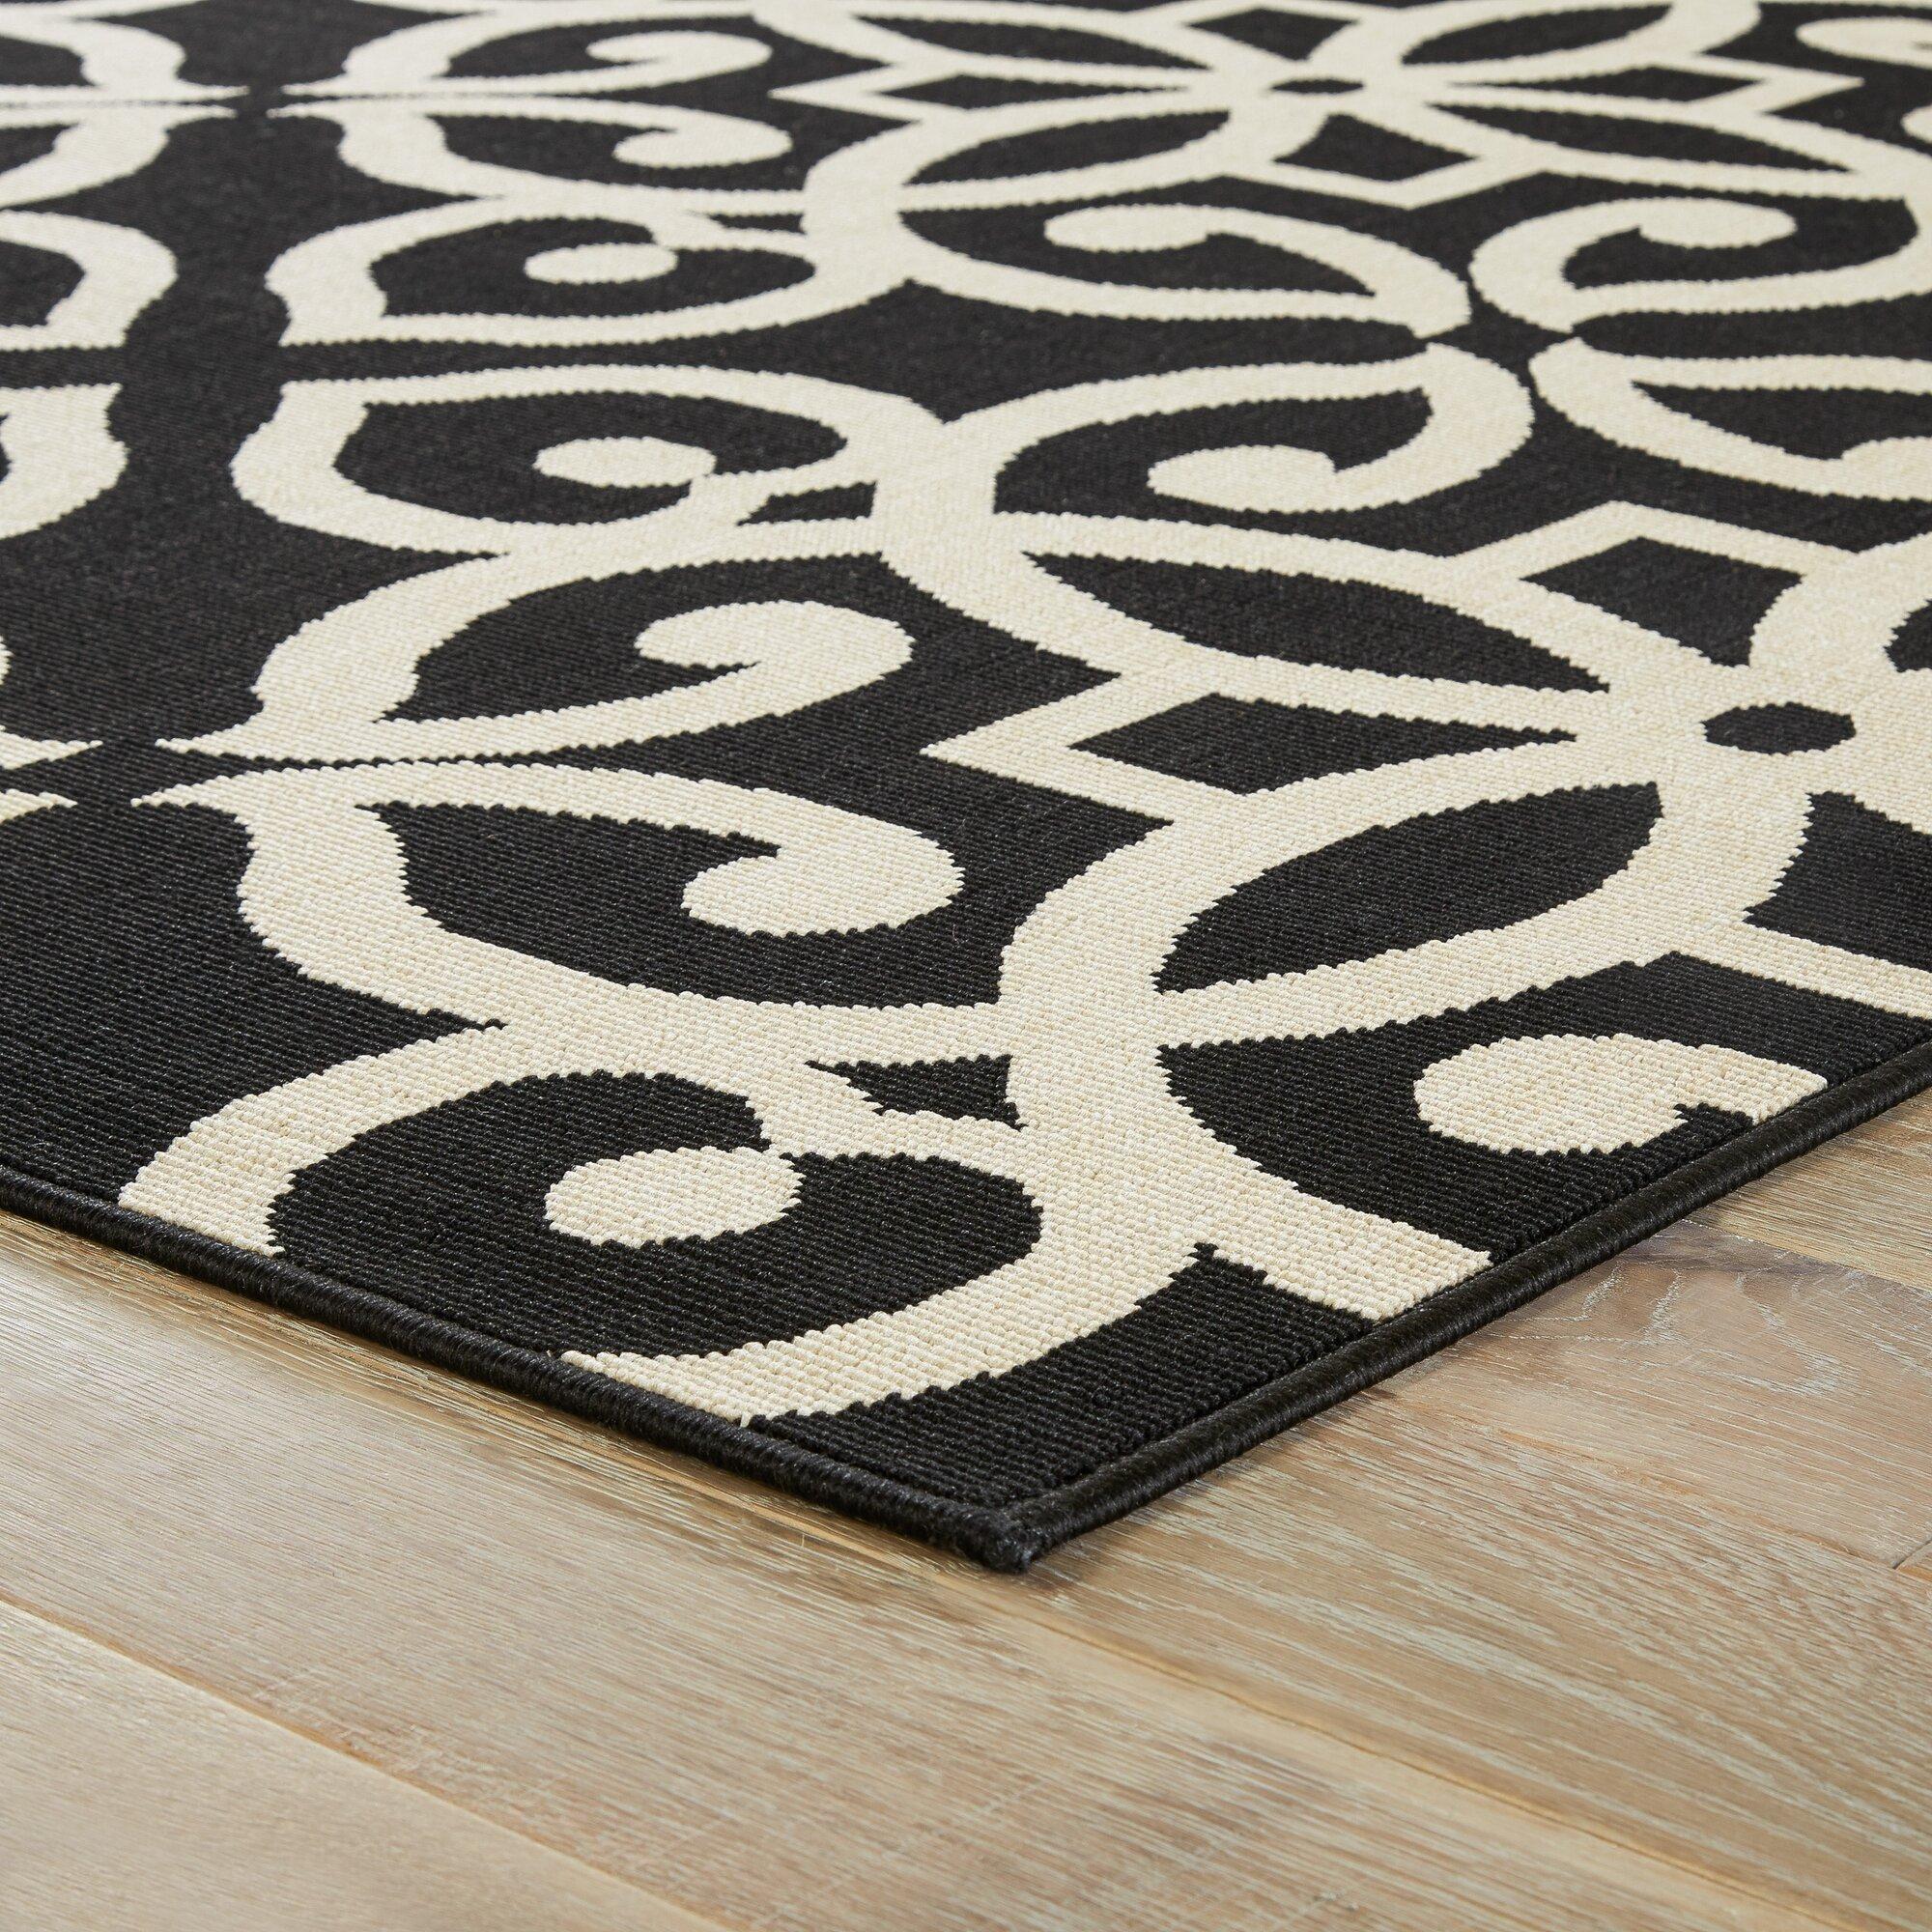 Mercer41™ Highgate Black Taupe Indoor Outdoor Area Rug